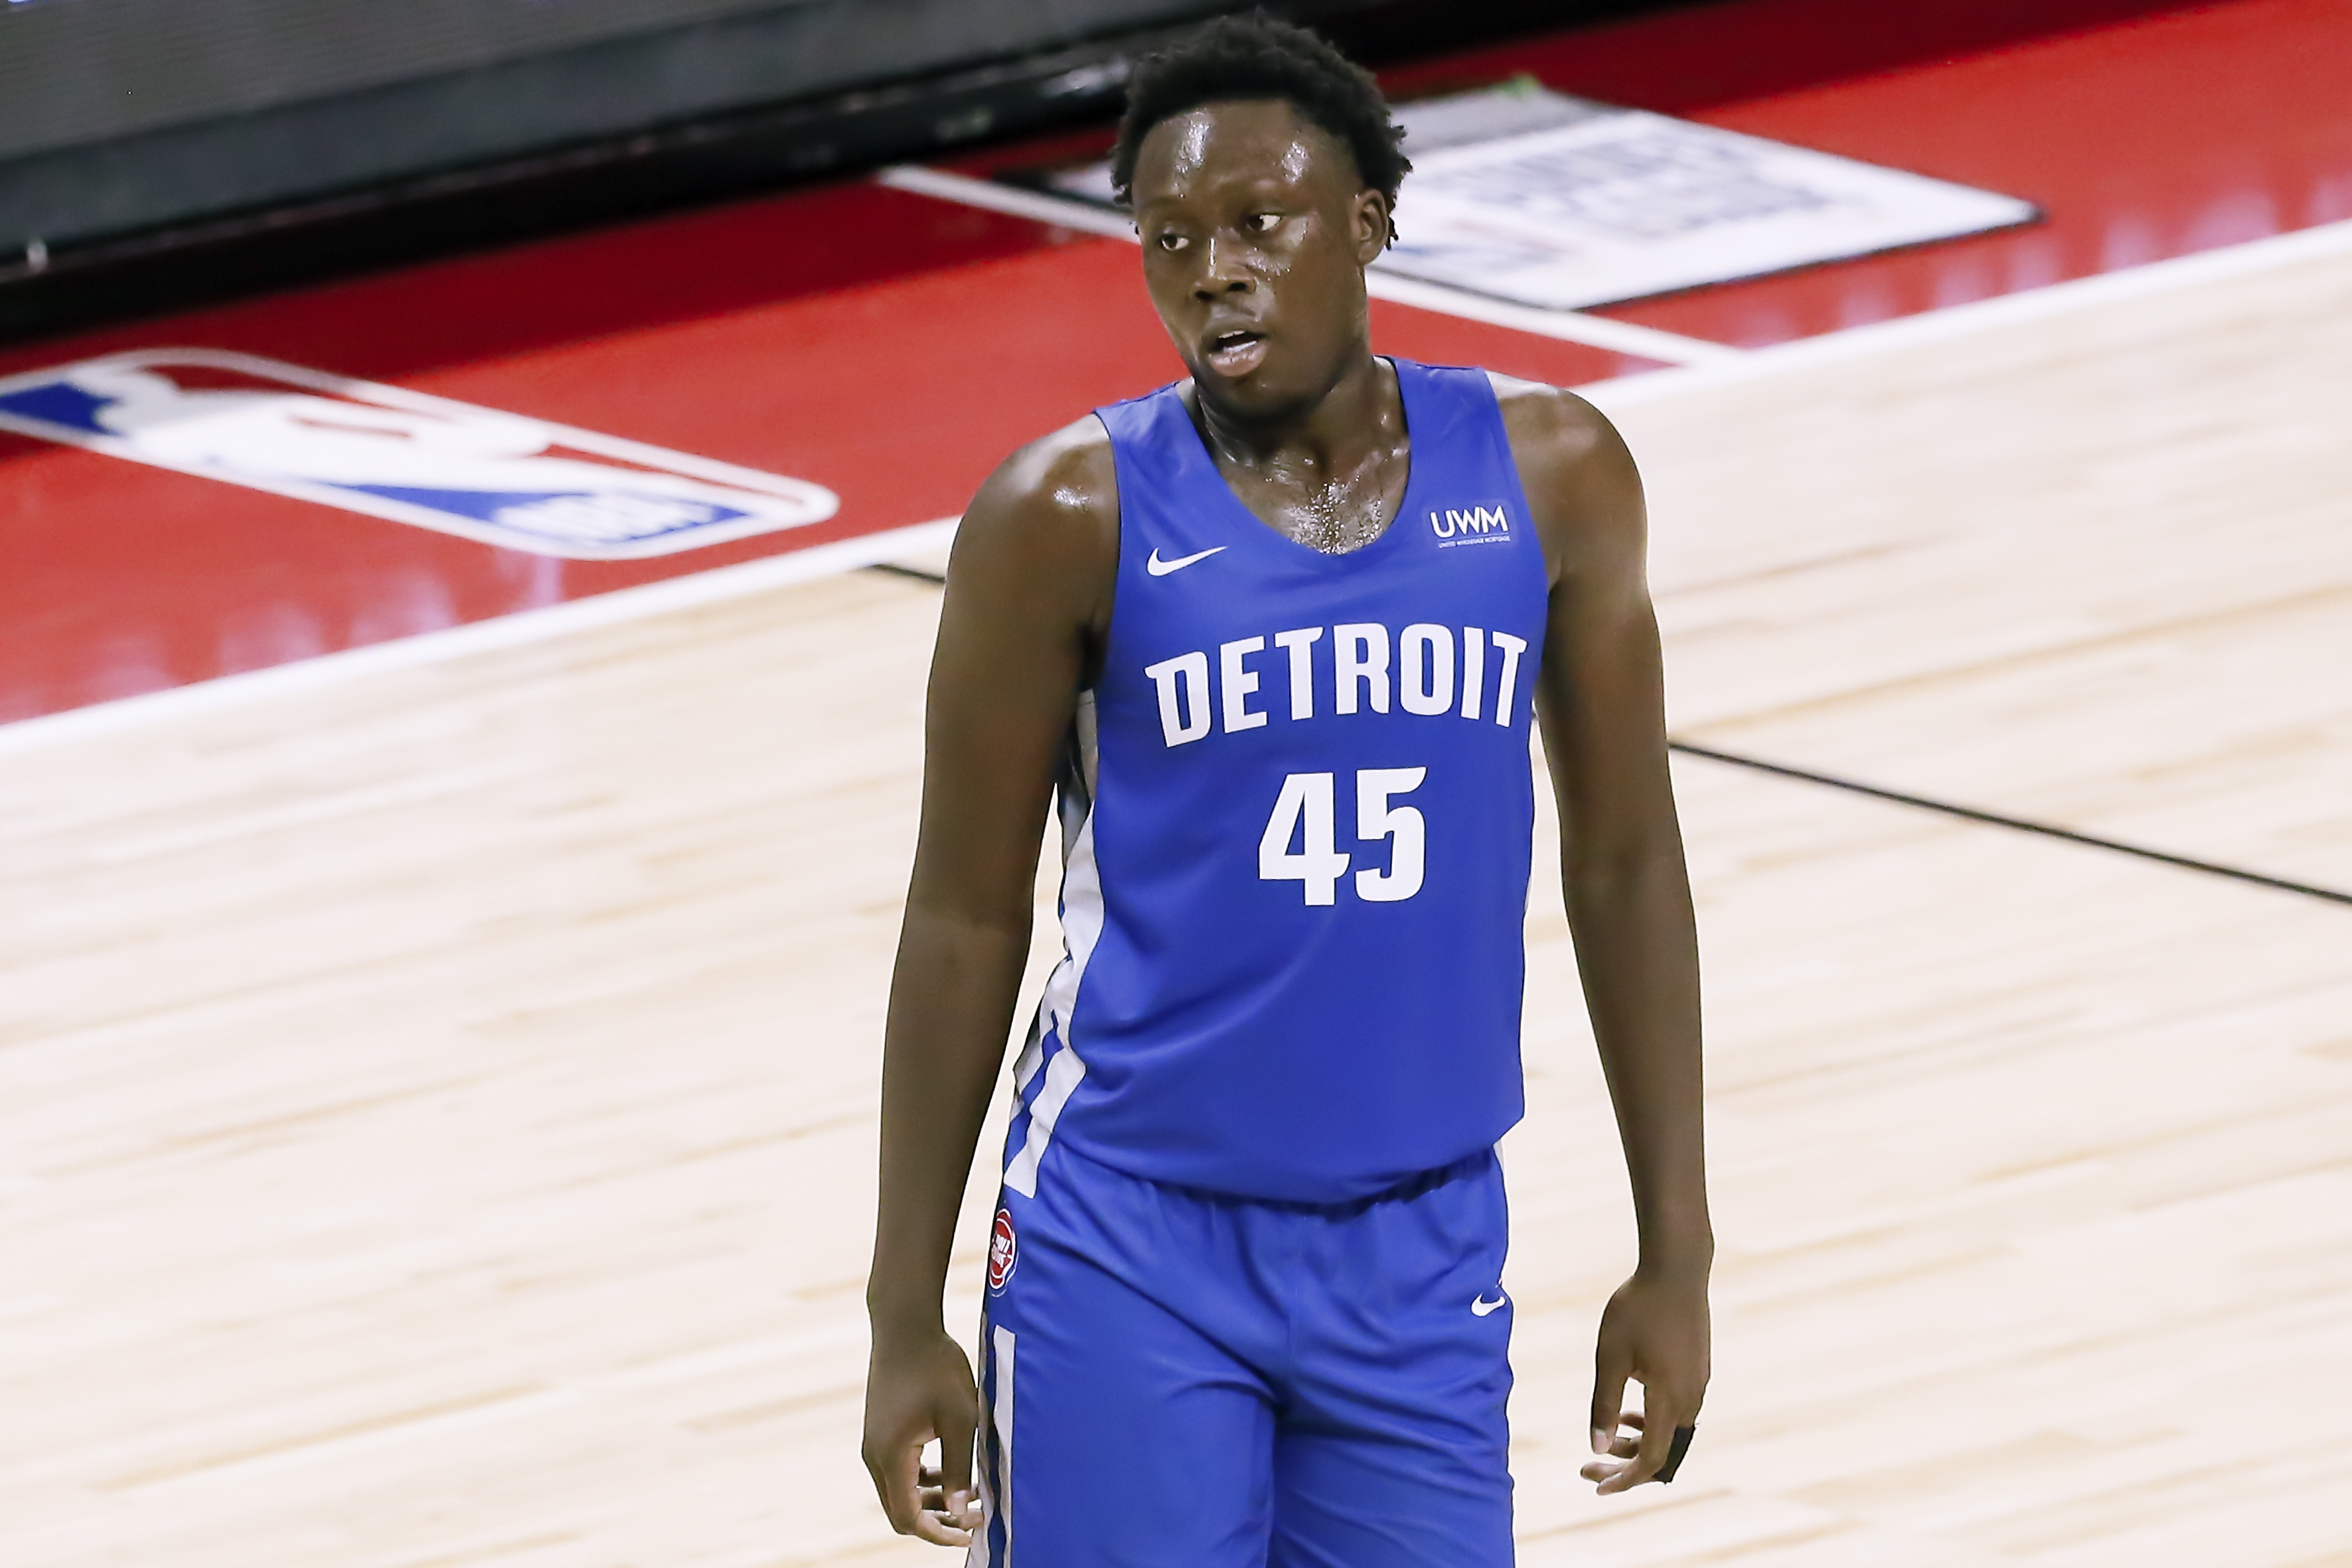 2021 Las Vegas Summer League - Houston Rockets v Detroit Pistons